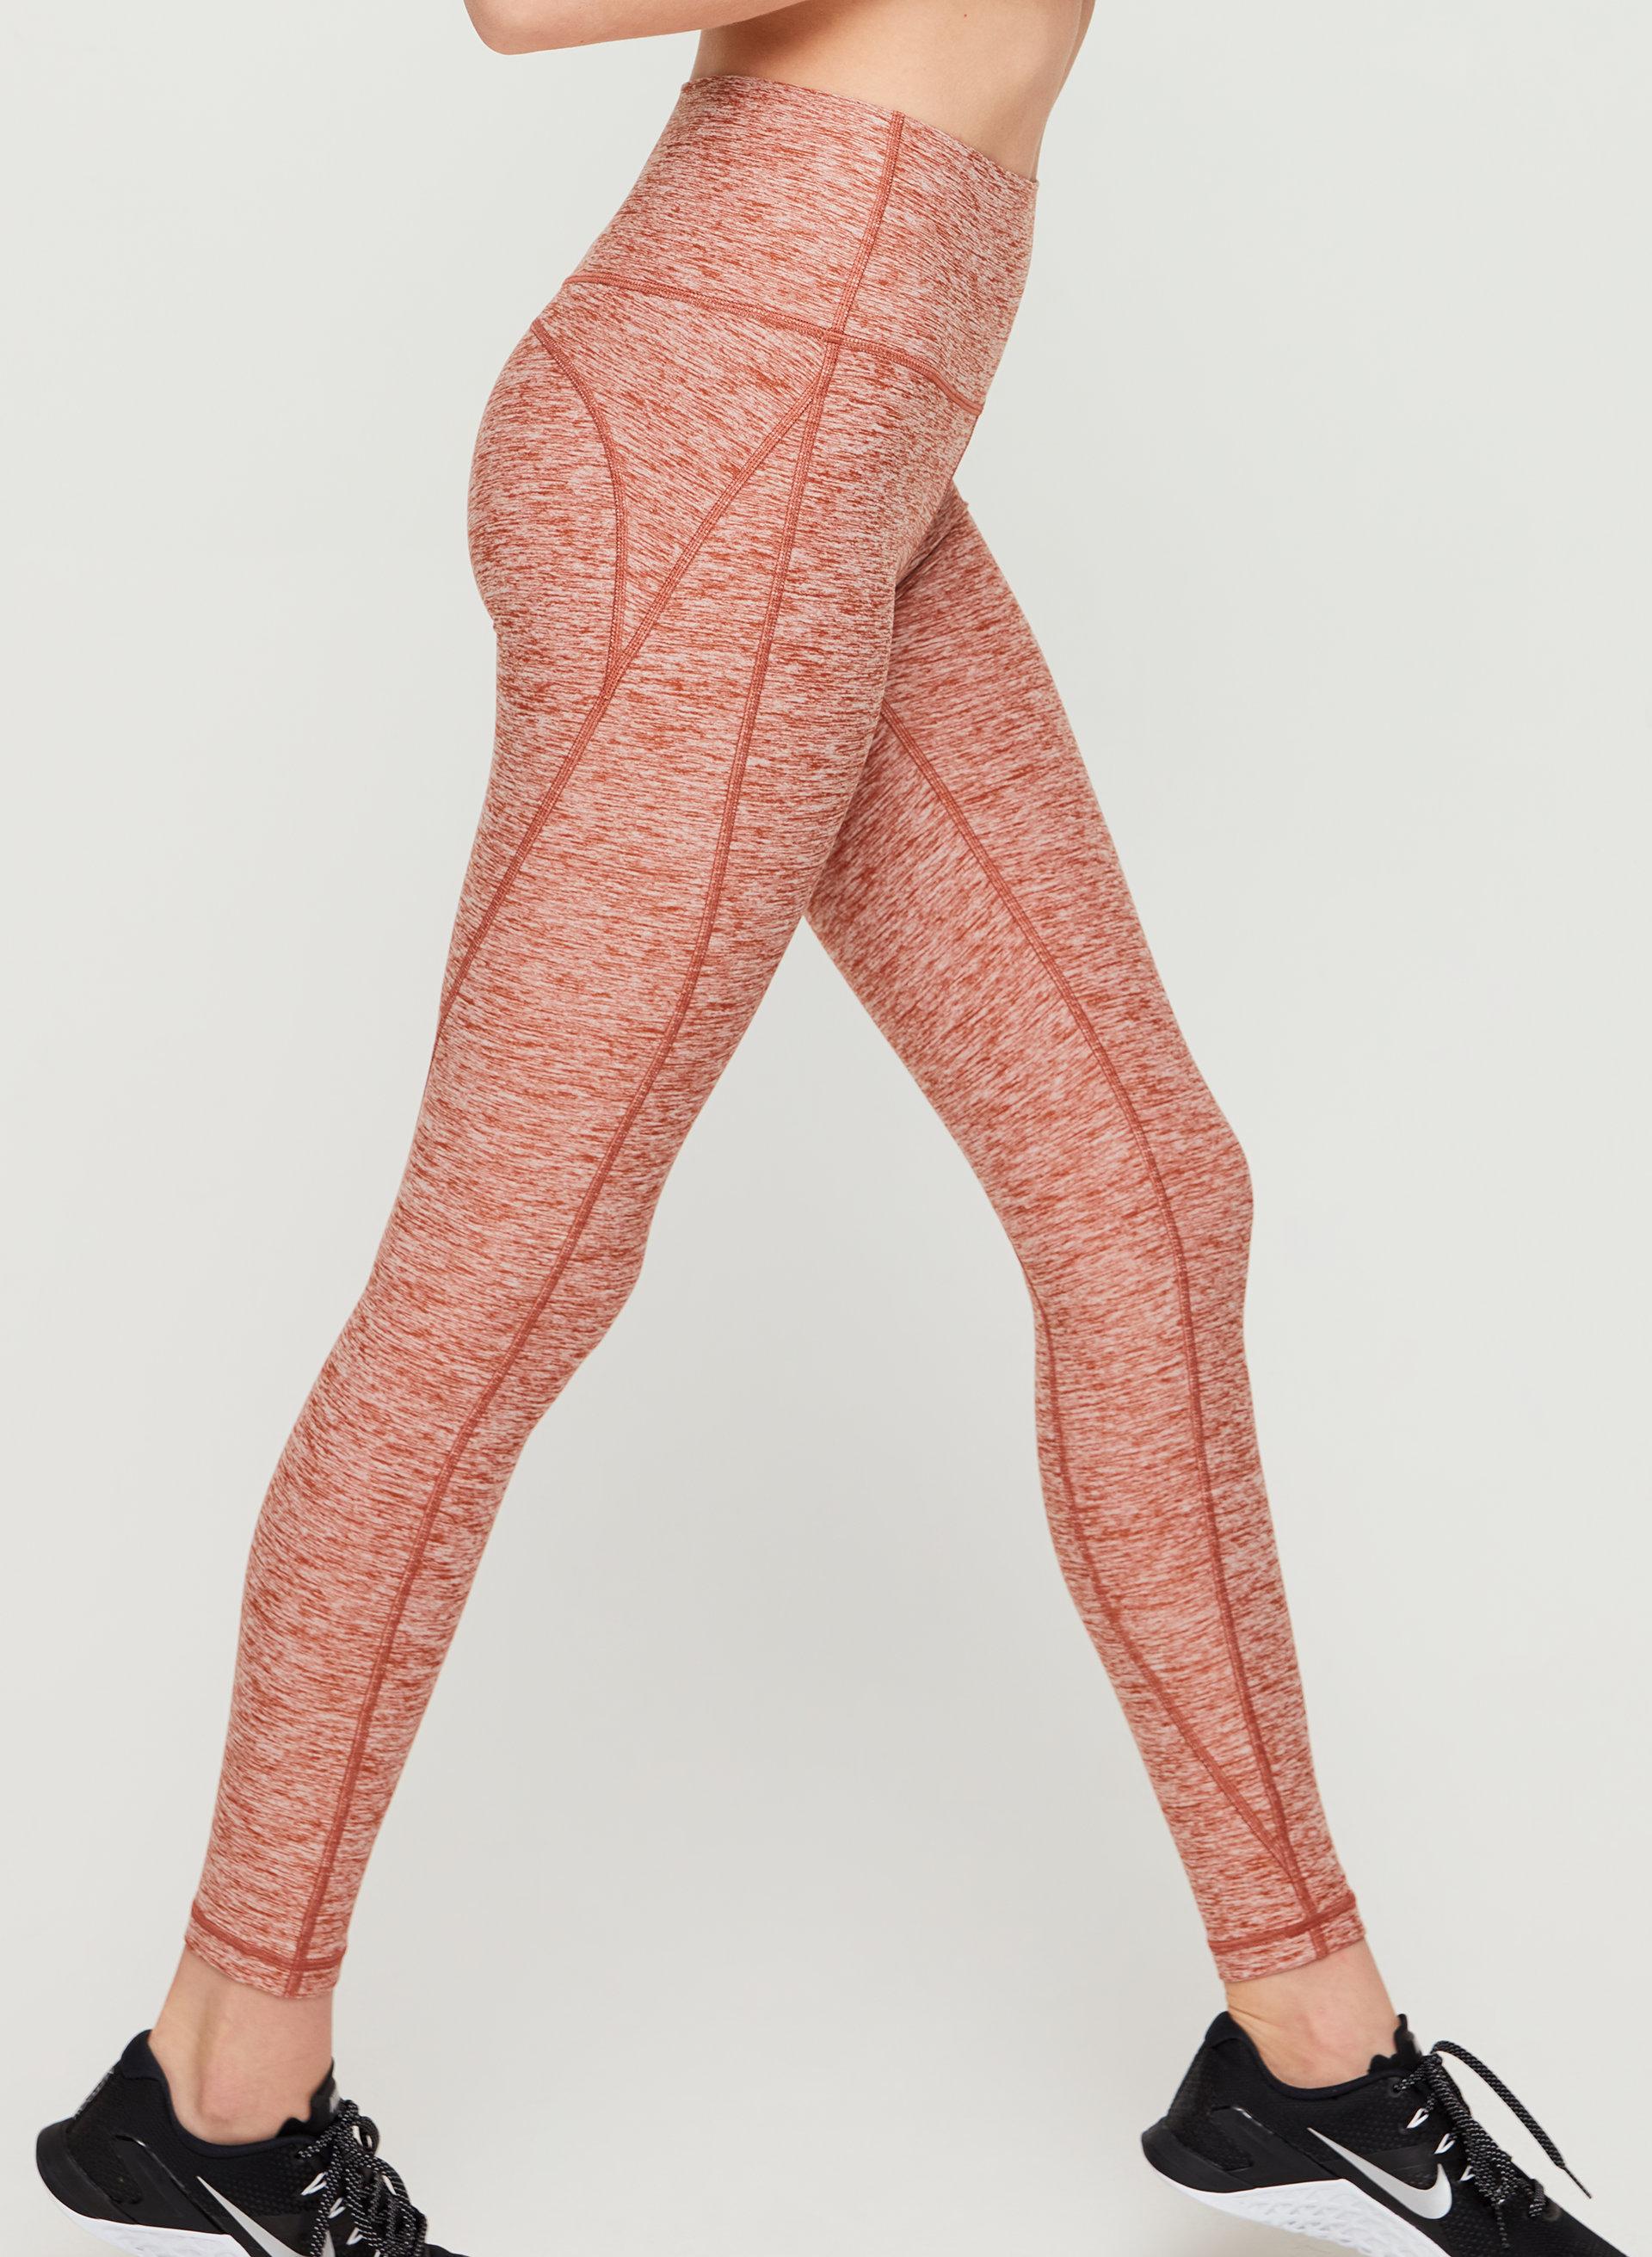 2a14896d888a8 RELAY TEAM PANT - High-waisted, workout legging